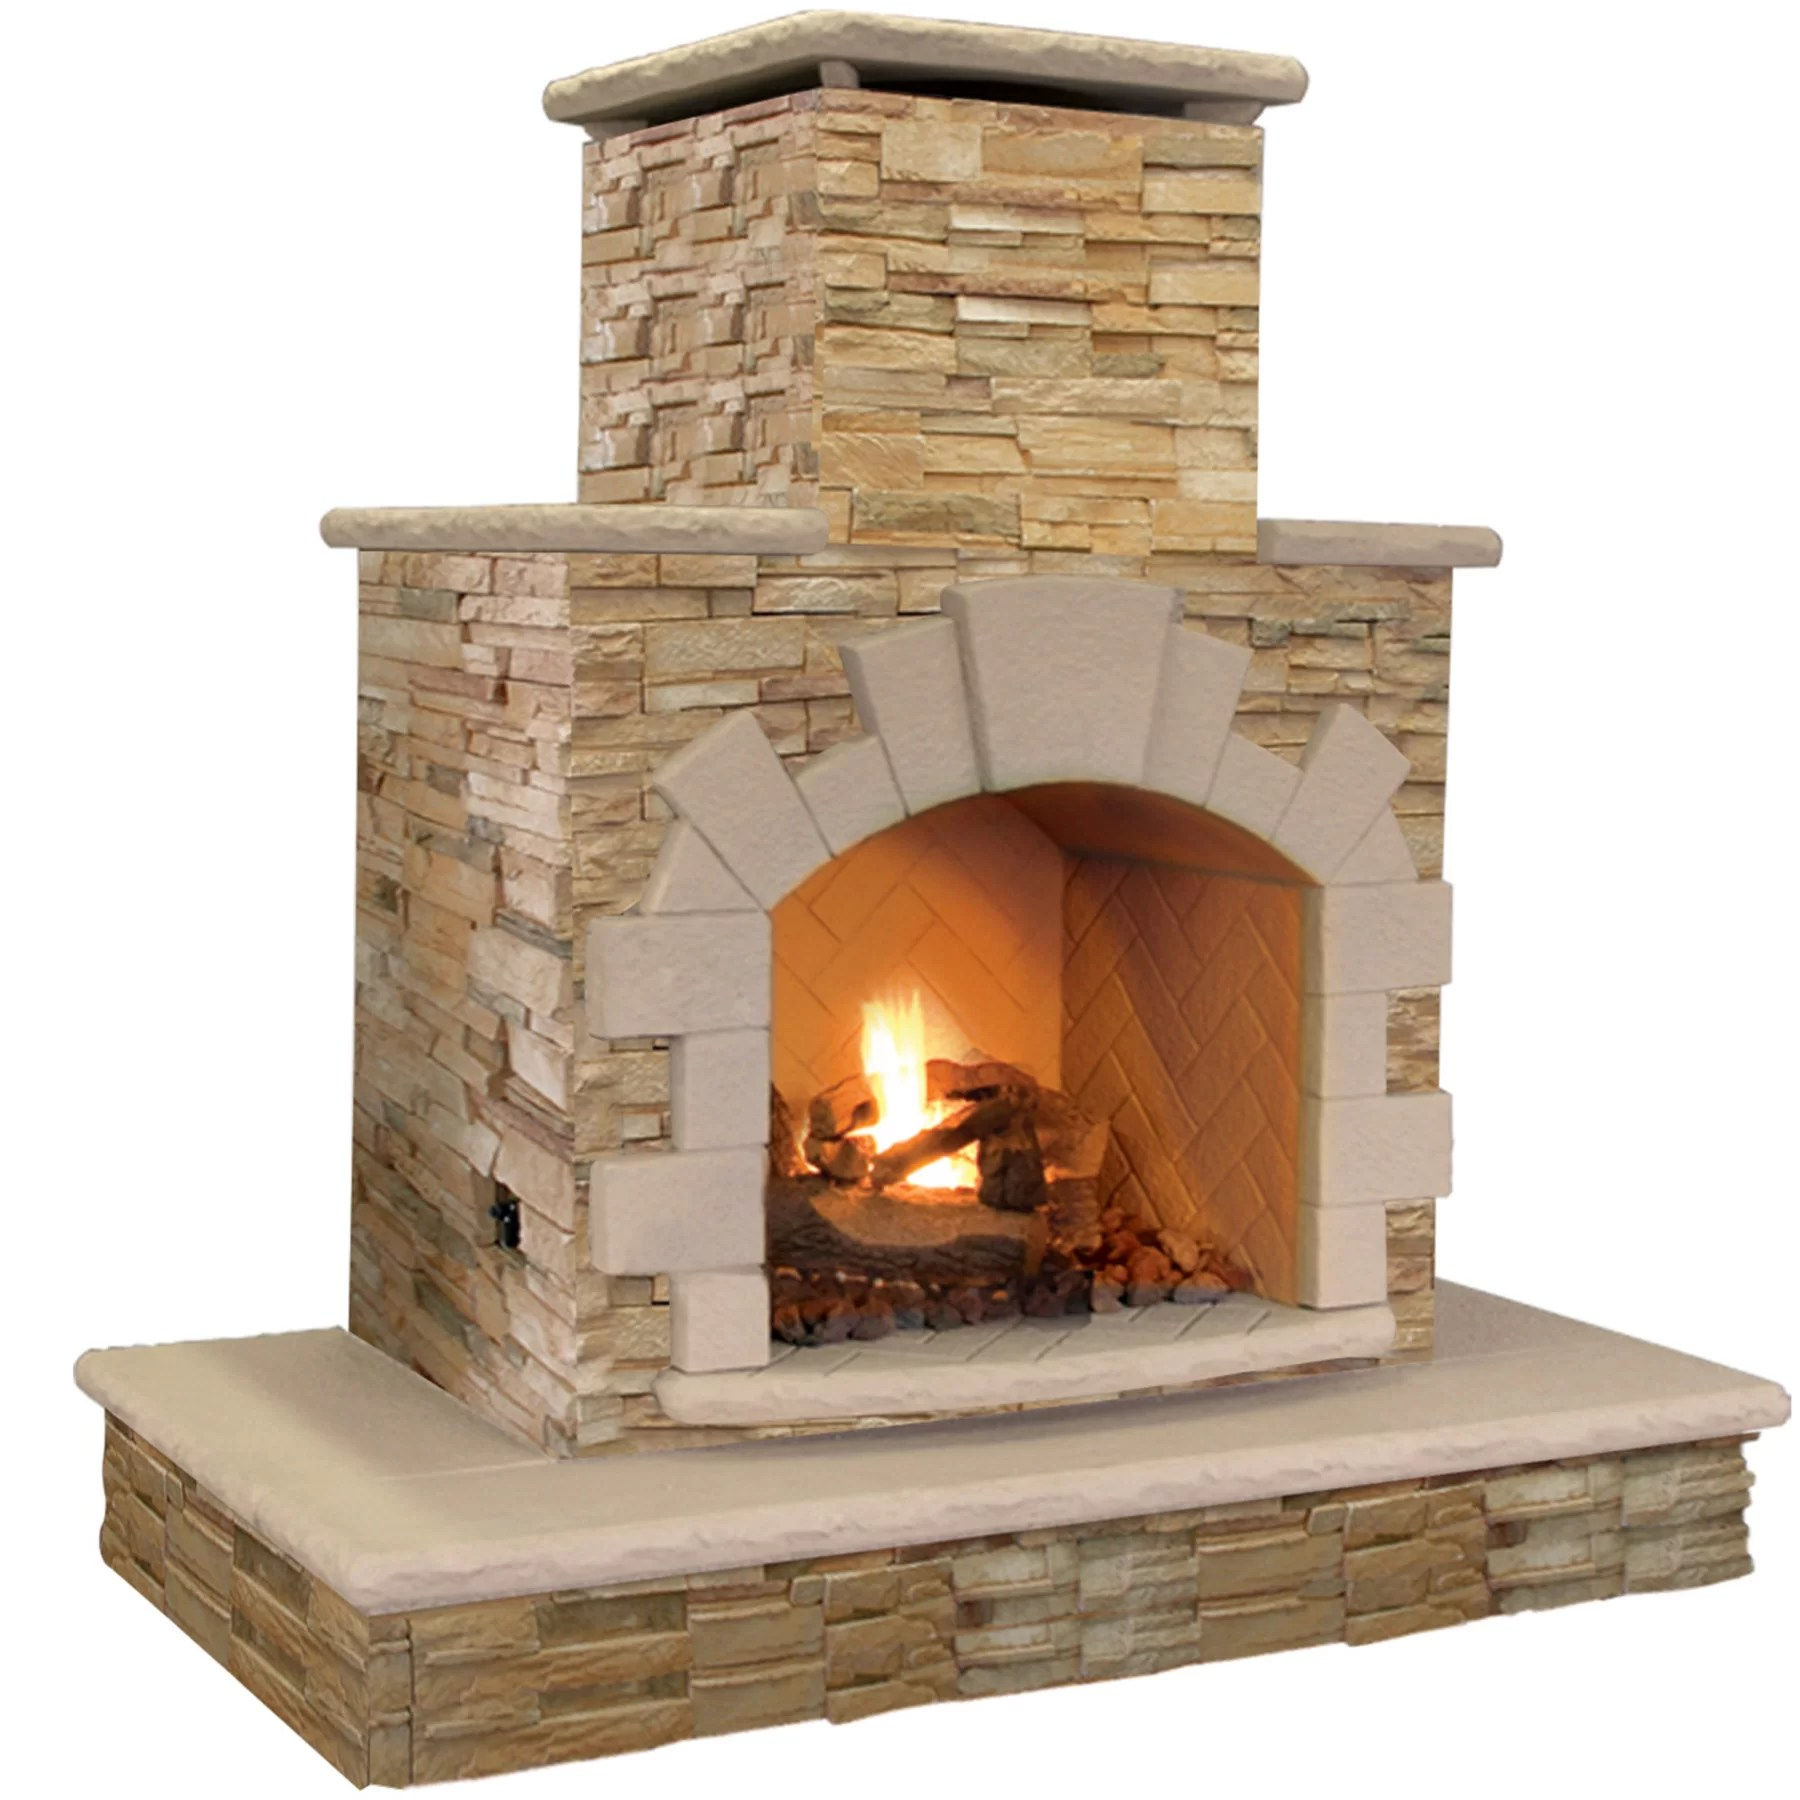 Natural Stone Propane  Gas Outdoor Fireplace  Wayfair